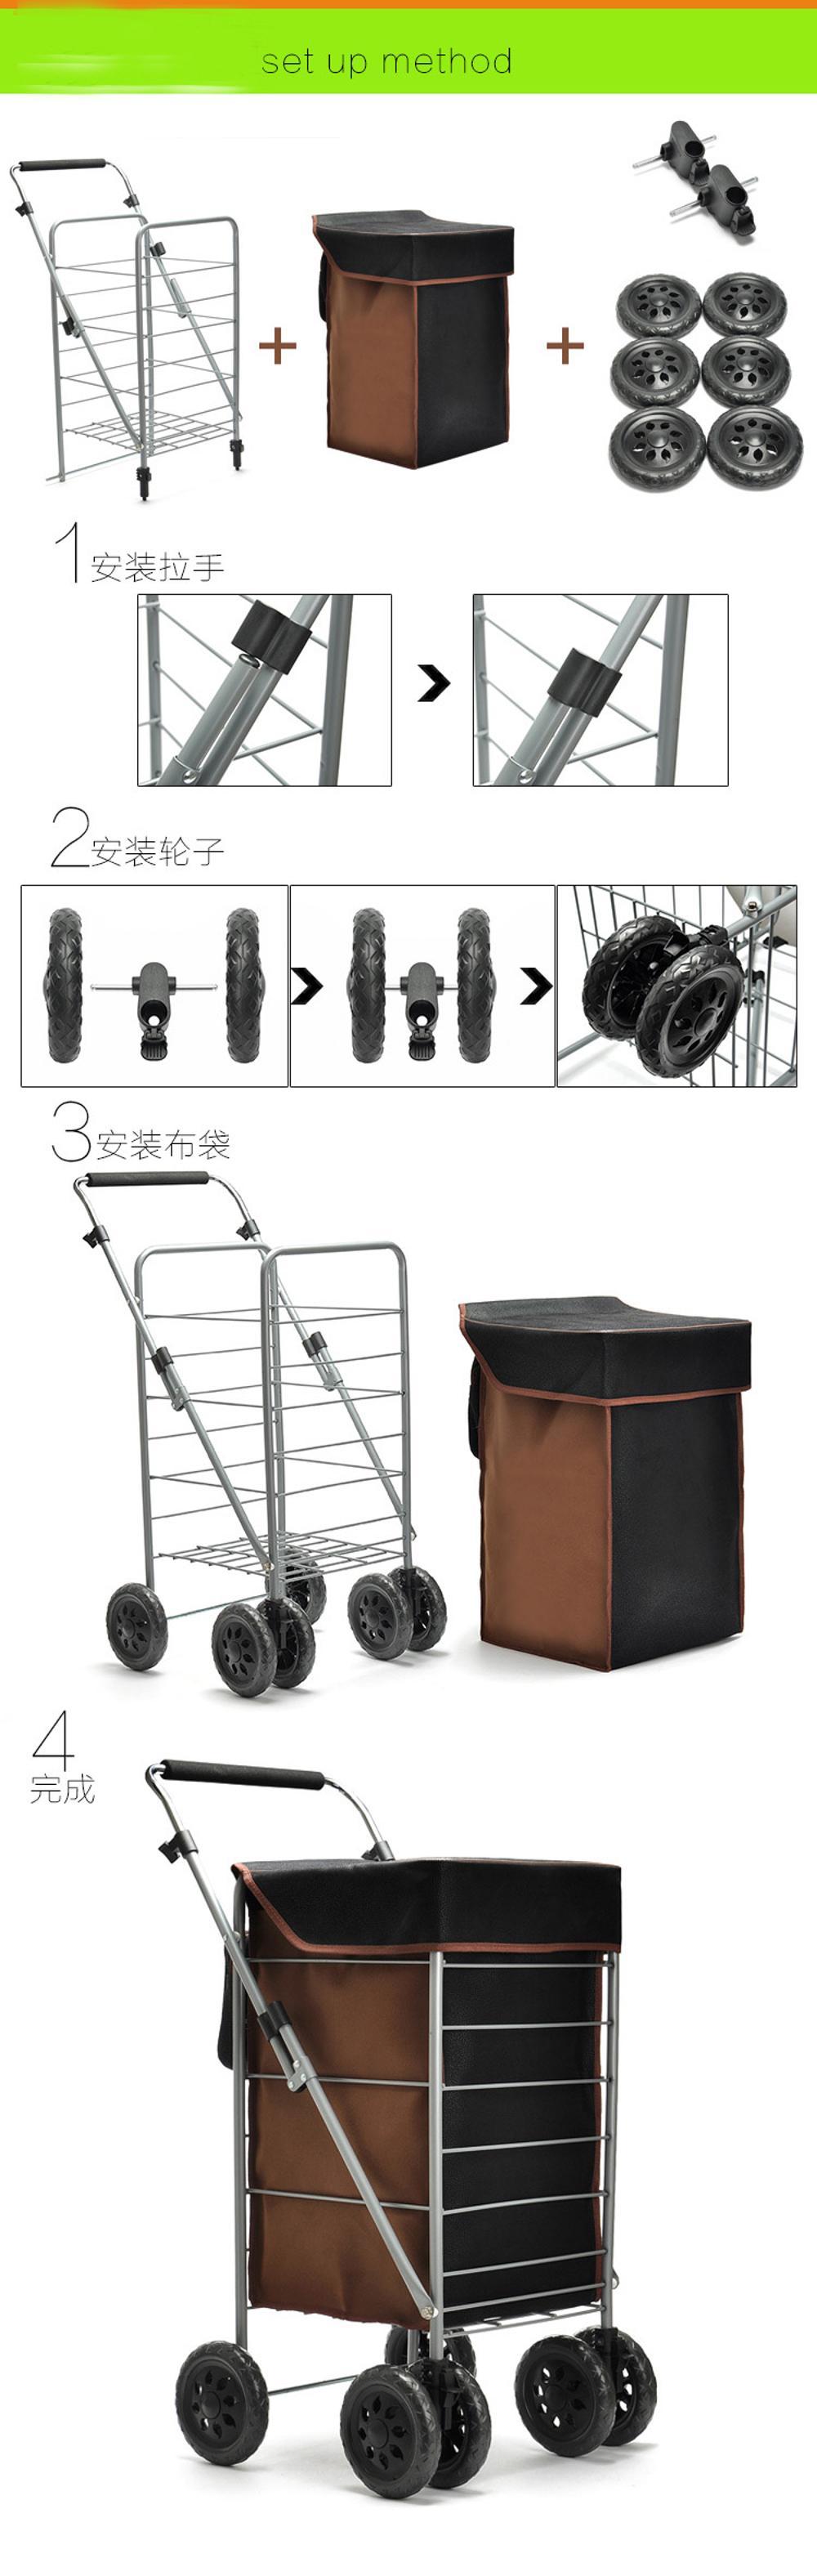 12d7cf1e3d84 China Big Cart, China Big Cart Manufacturers and Suppliers on ...